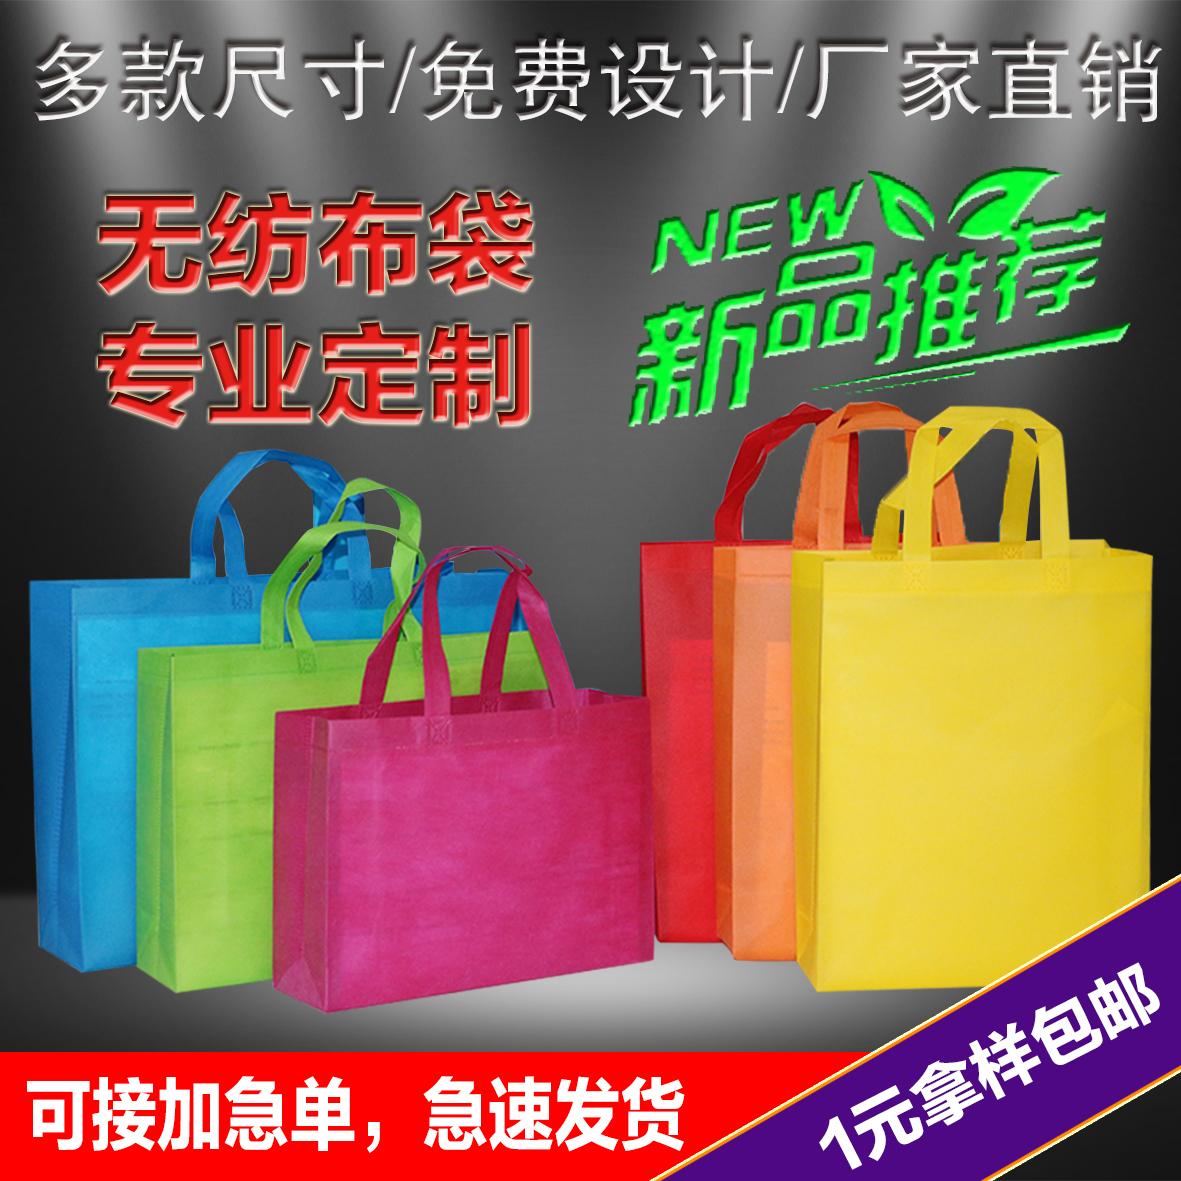 Non woven bag, custom-made handbag, custom-made environmental protection bag, custom-made backpack, double shoulder shopping canvas bag, logo can be printed